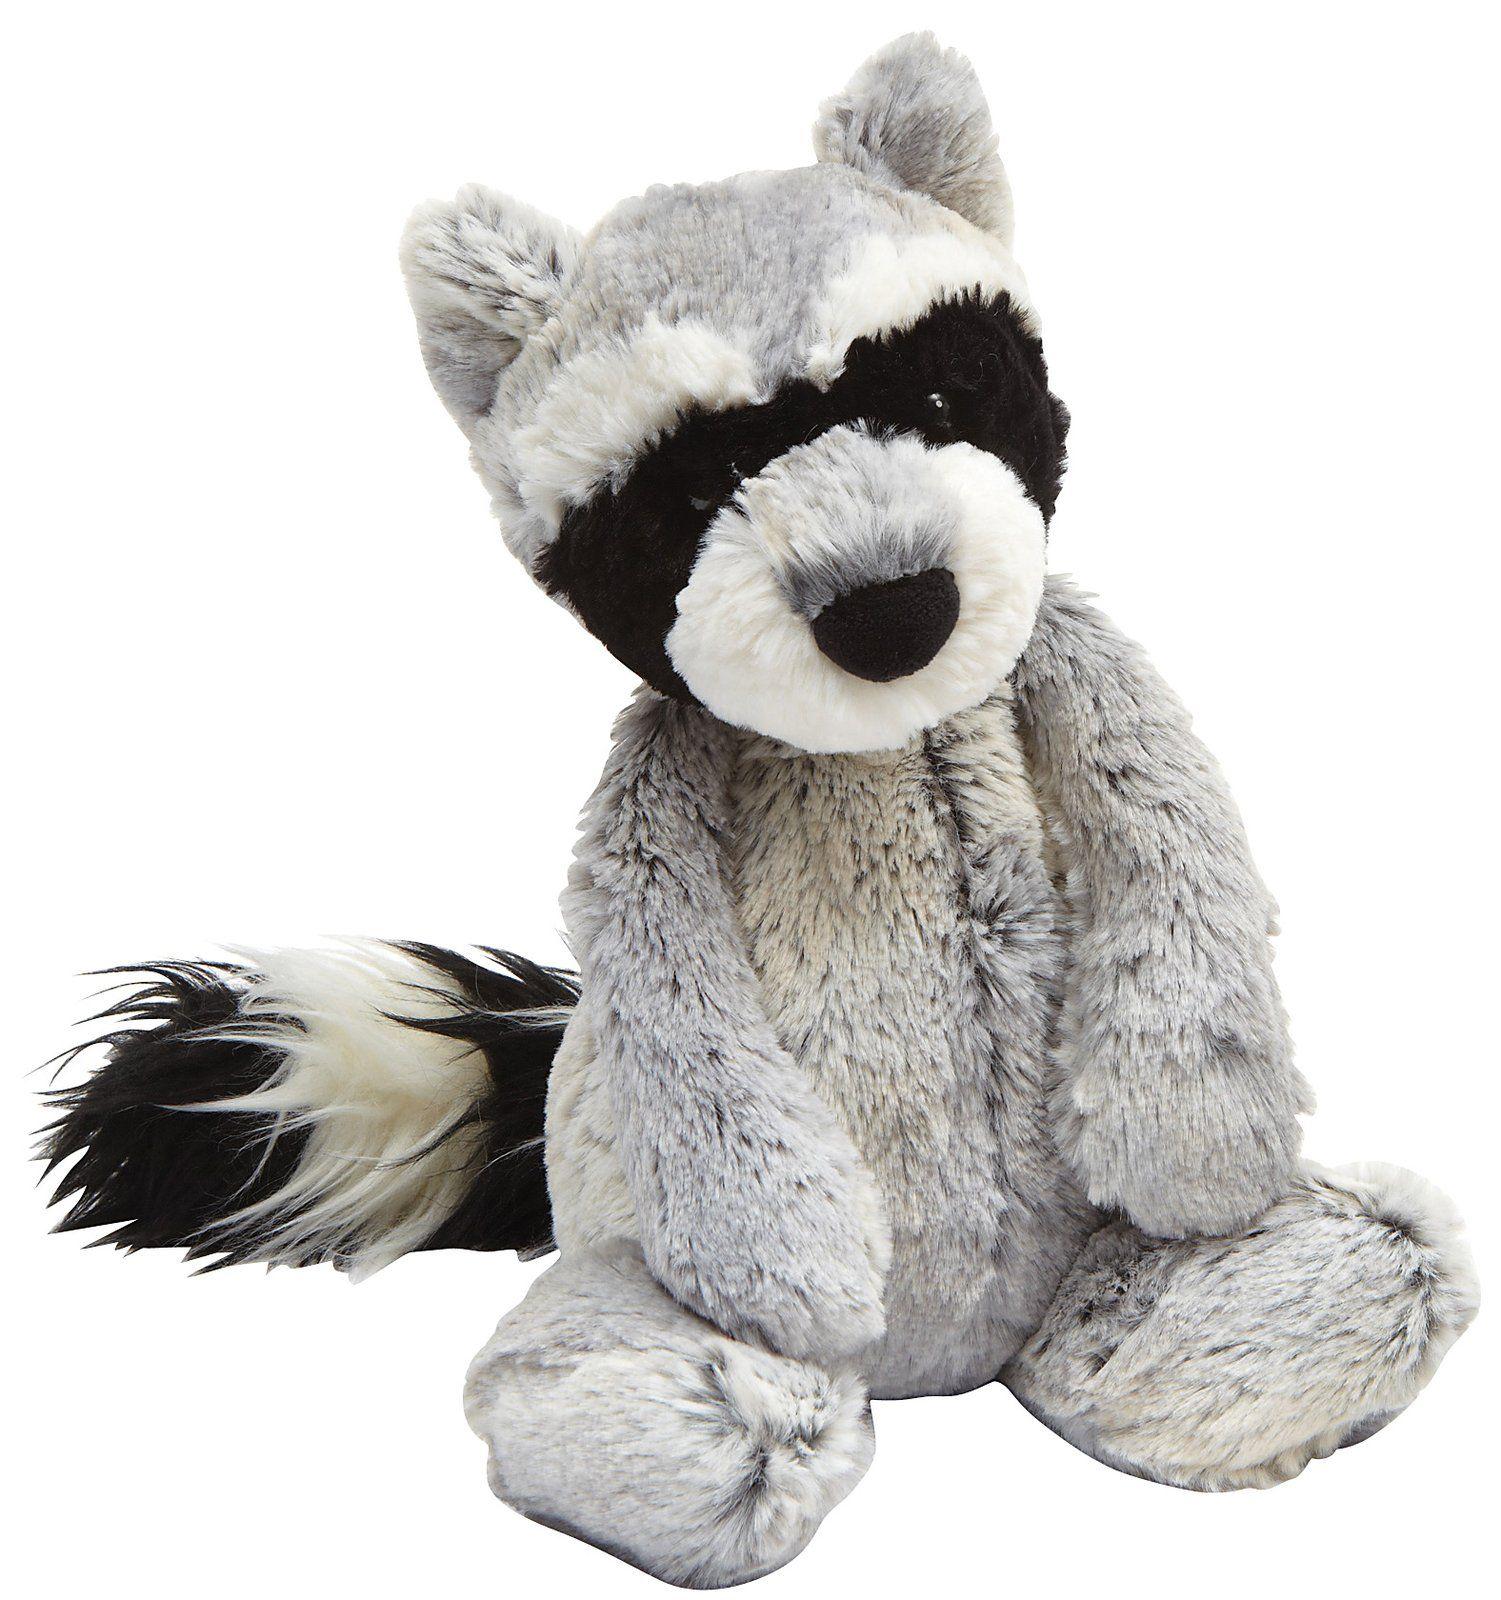 Jellycat Woodland Raccoon Jellycat Stuffed Animals Raccoon Stuffed Animal Teddy Bear Stuffed Animal